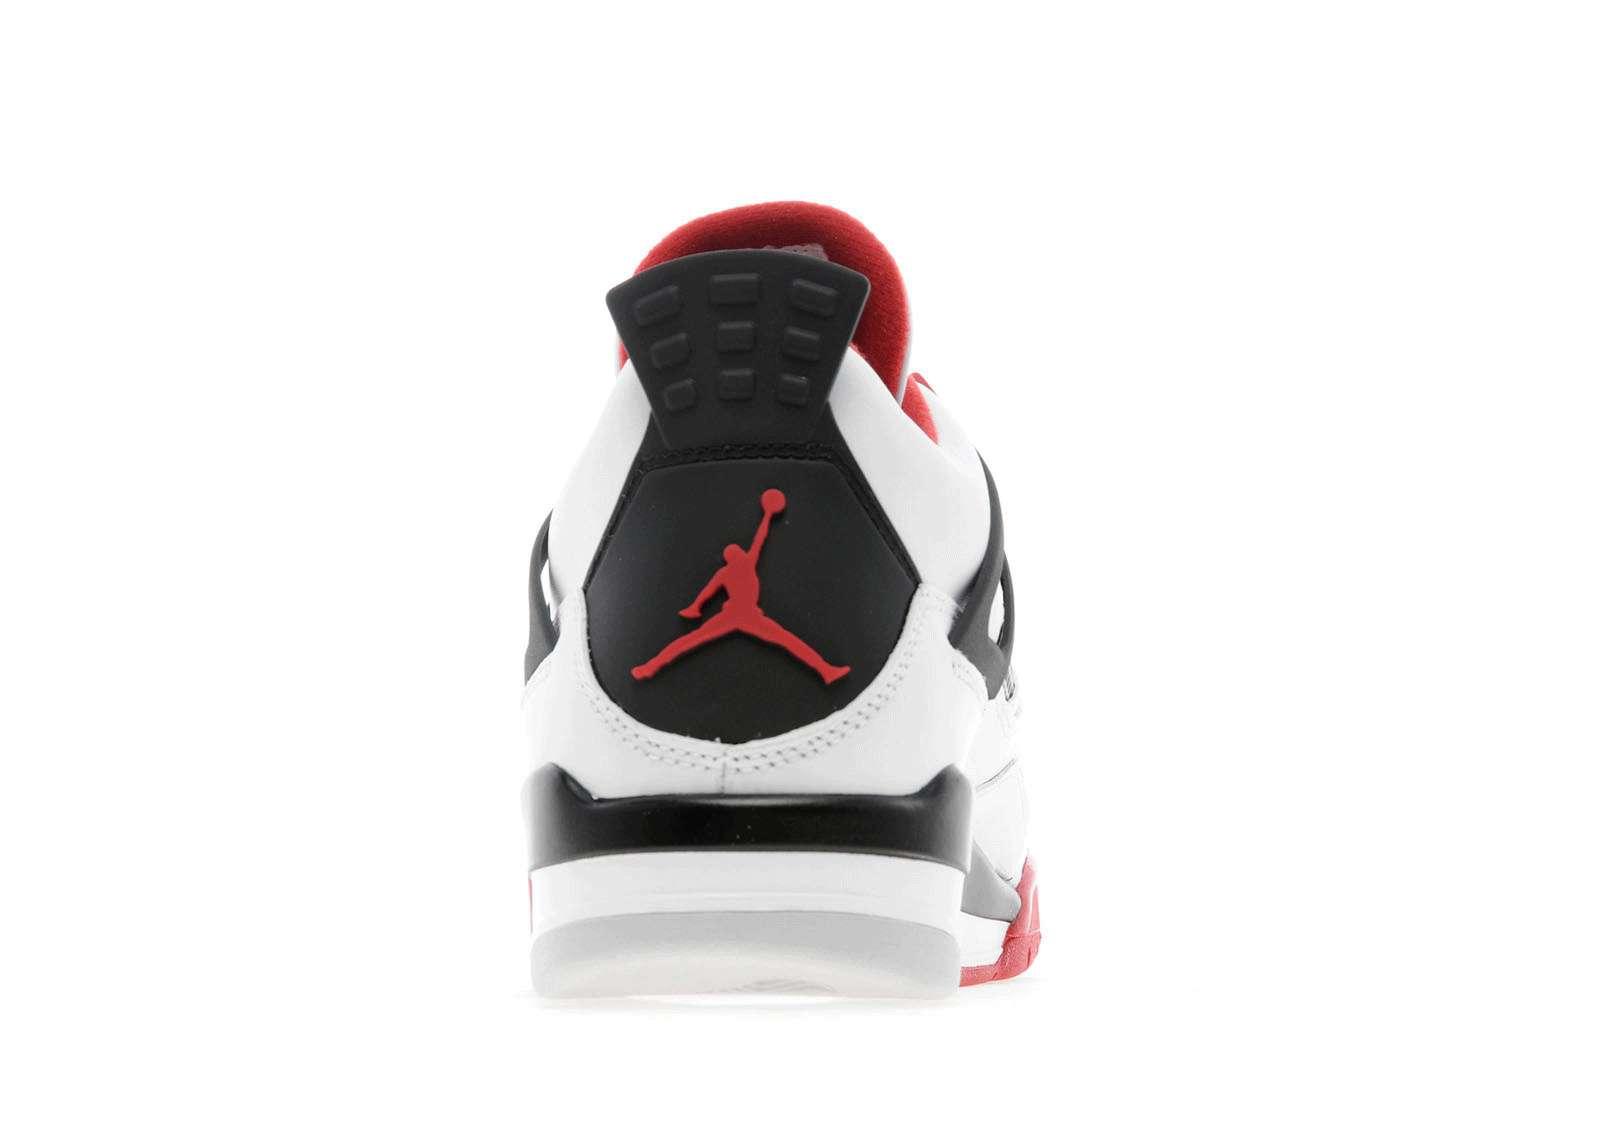 Jordan IV Retro